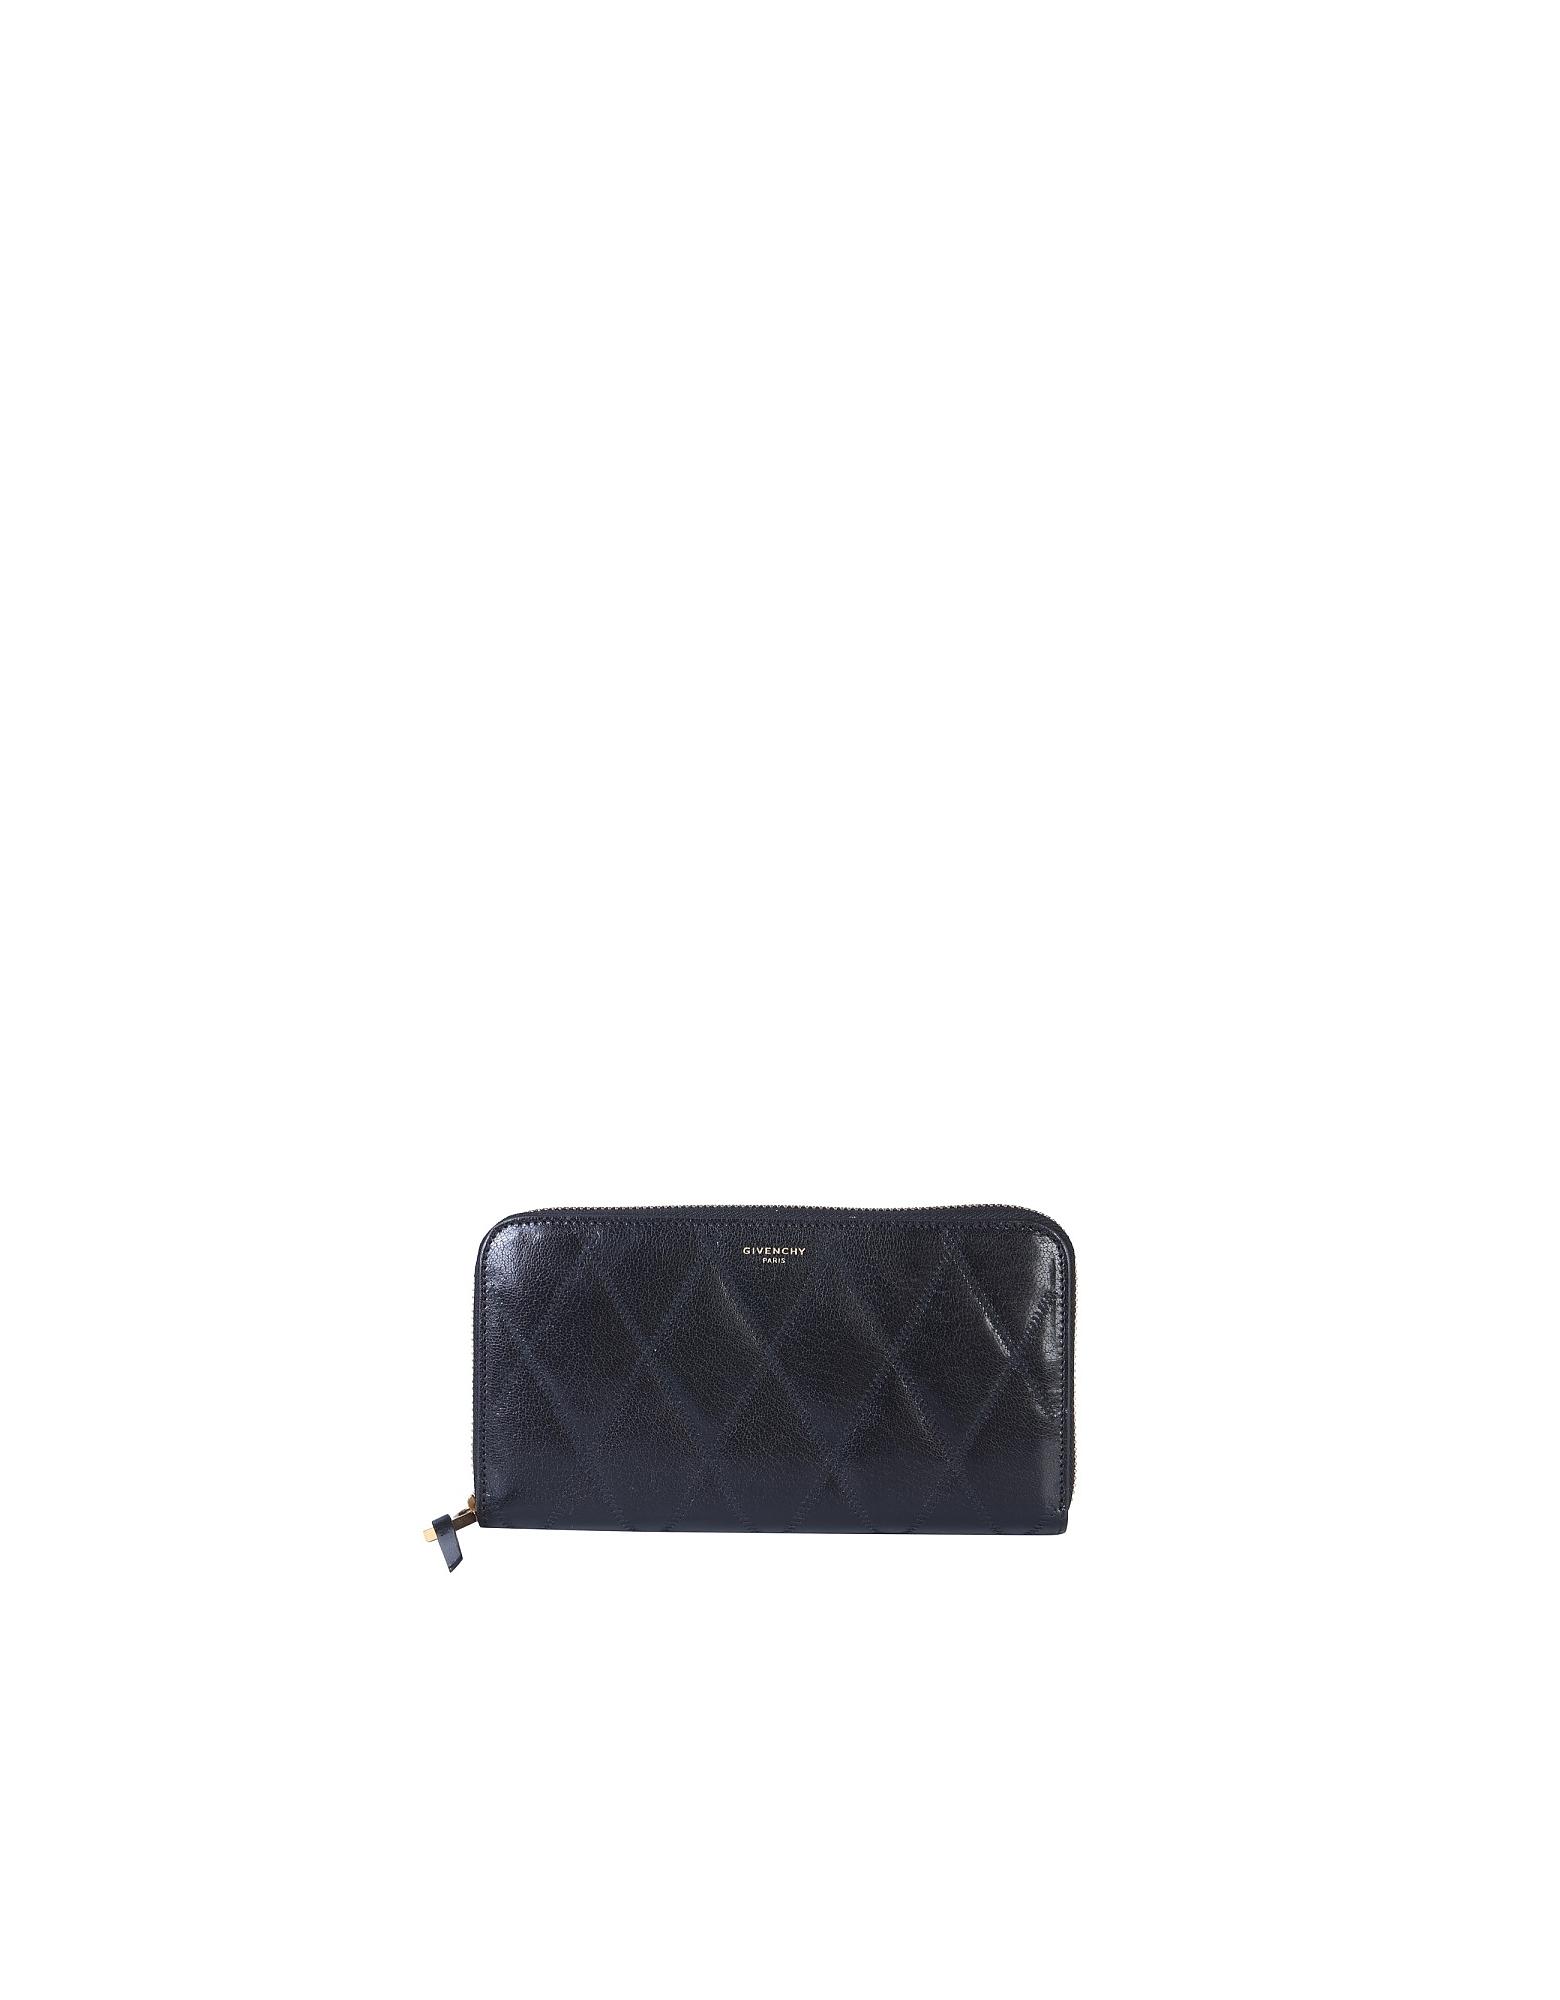 Givenchy Designer Wallets, Gv3 Wallet